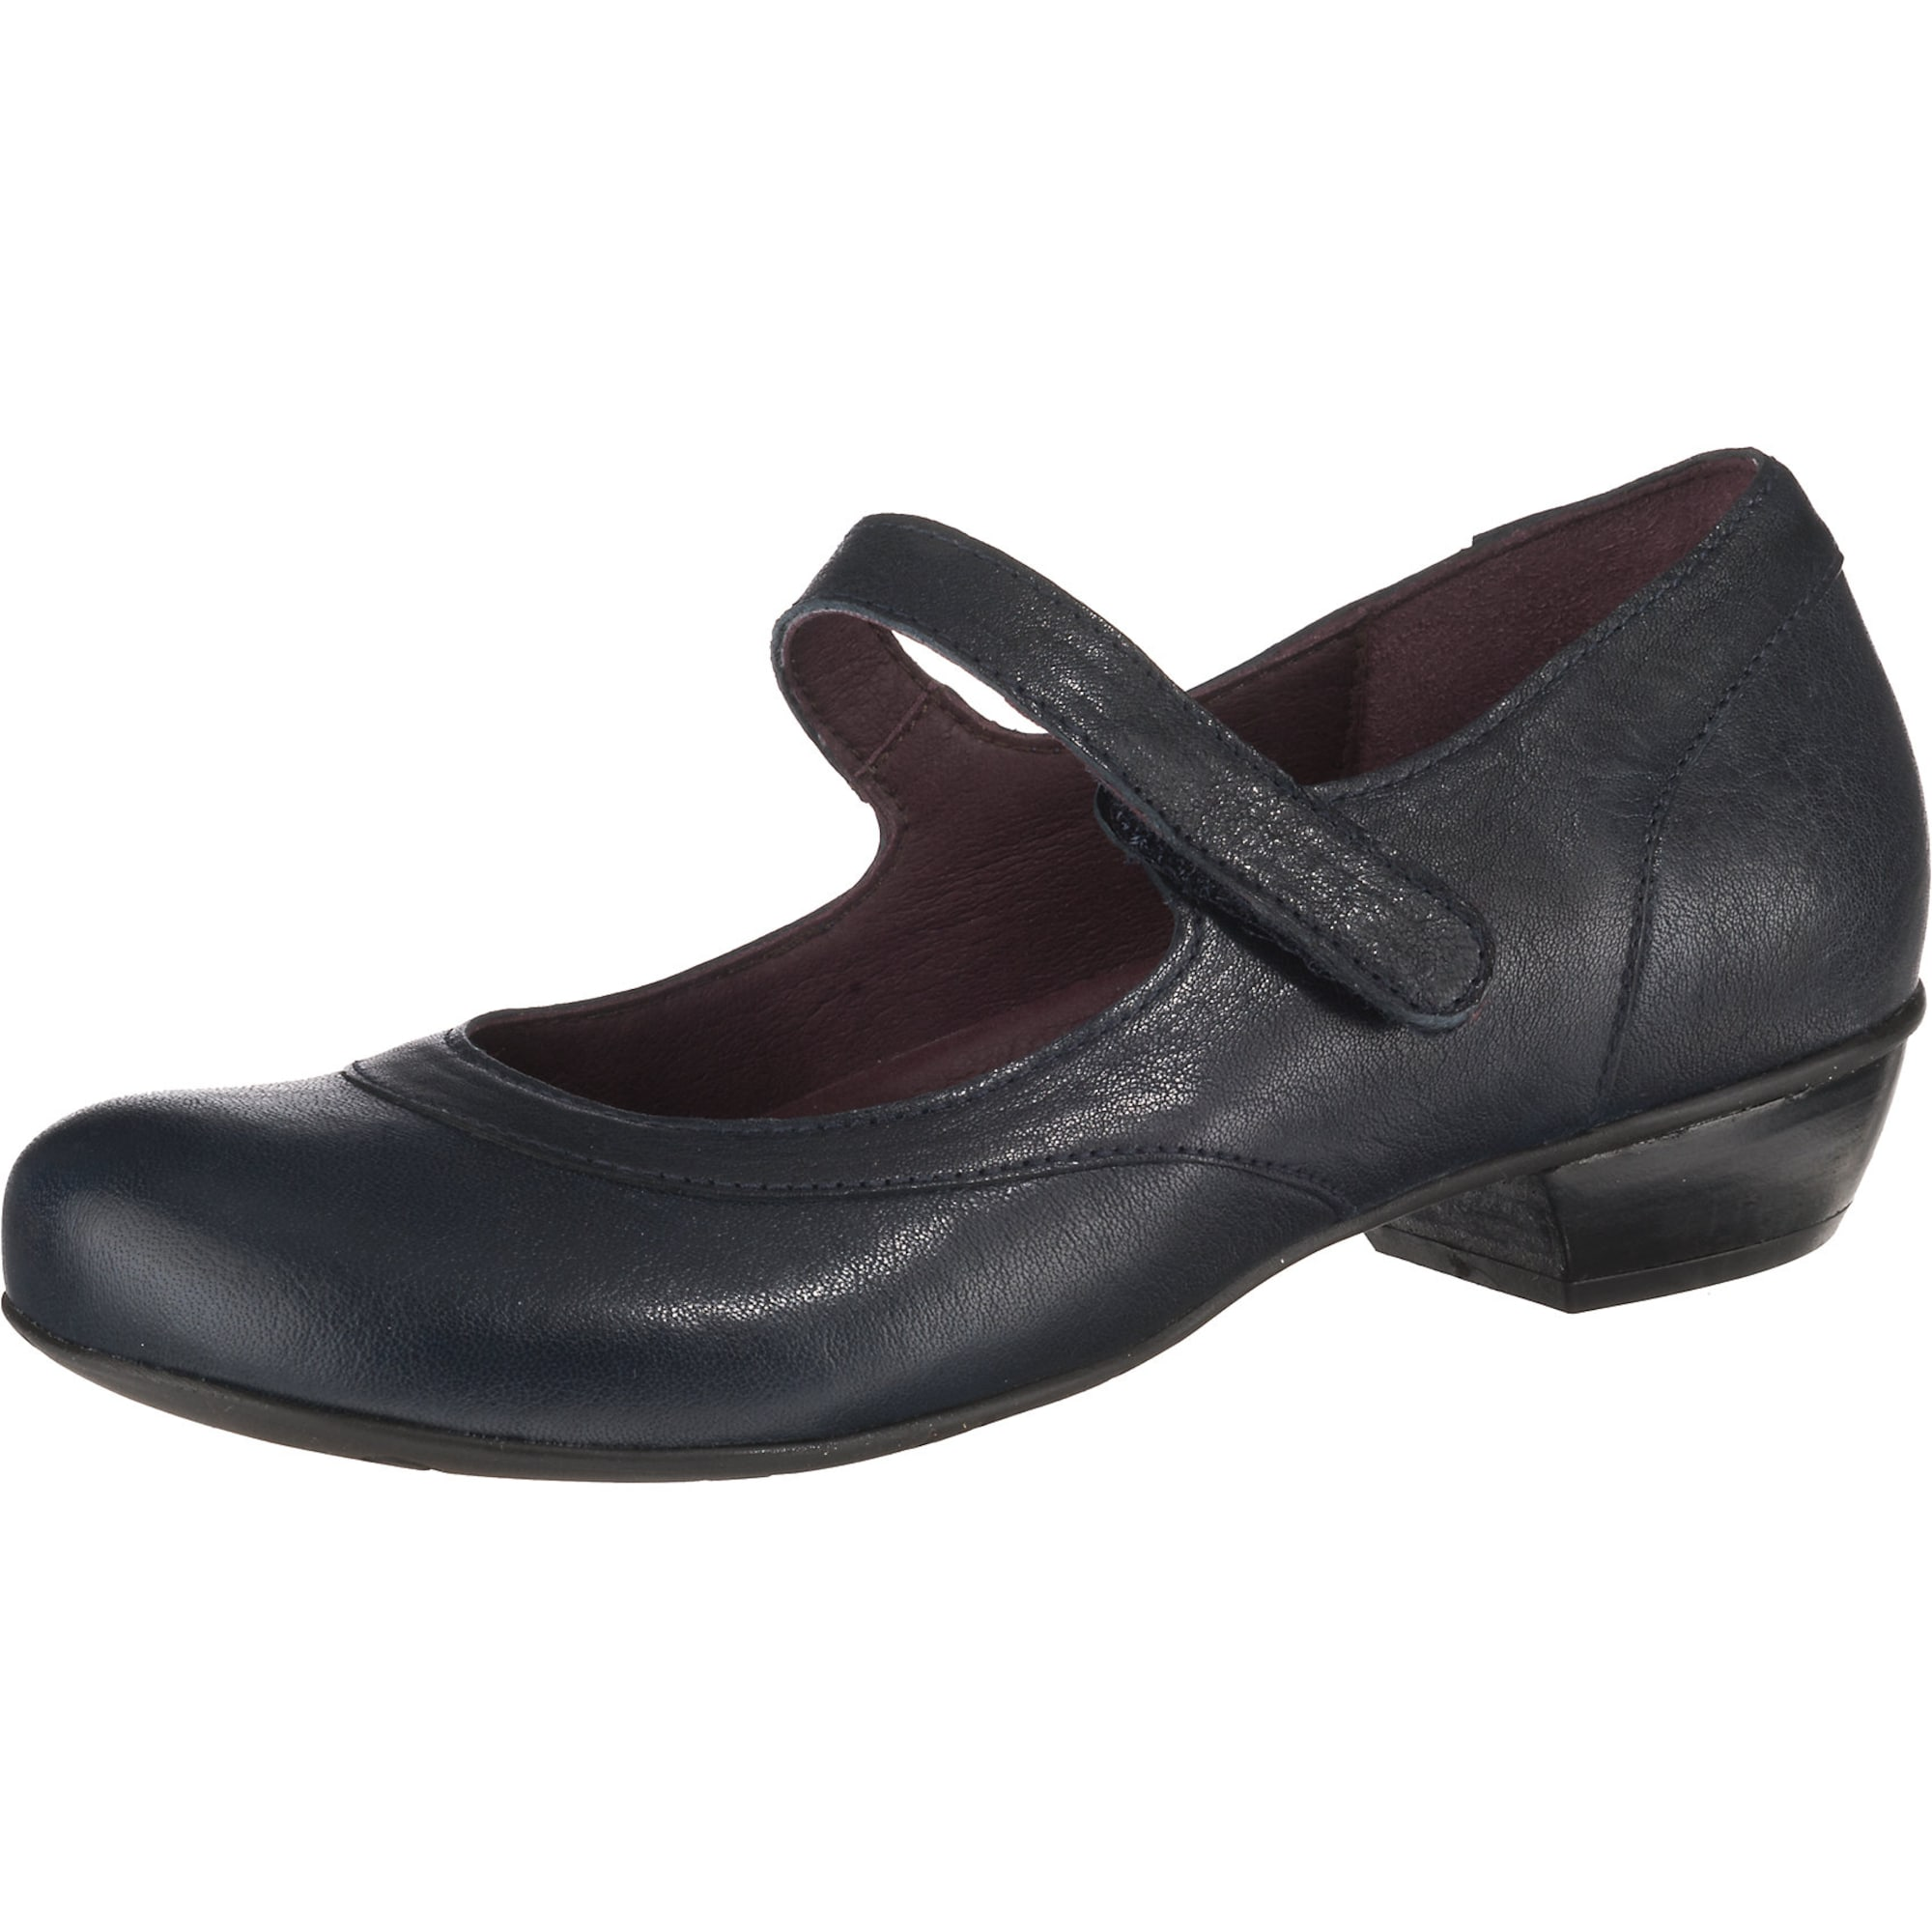 Riemchenballerinas | Schuhe > Ballerinas > Riemchenballerinas | Brako